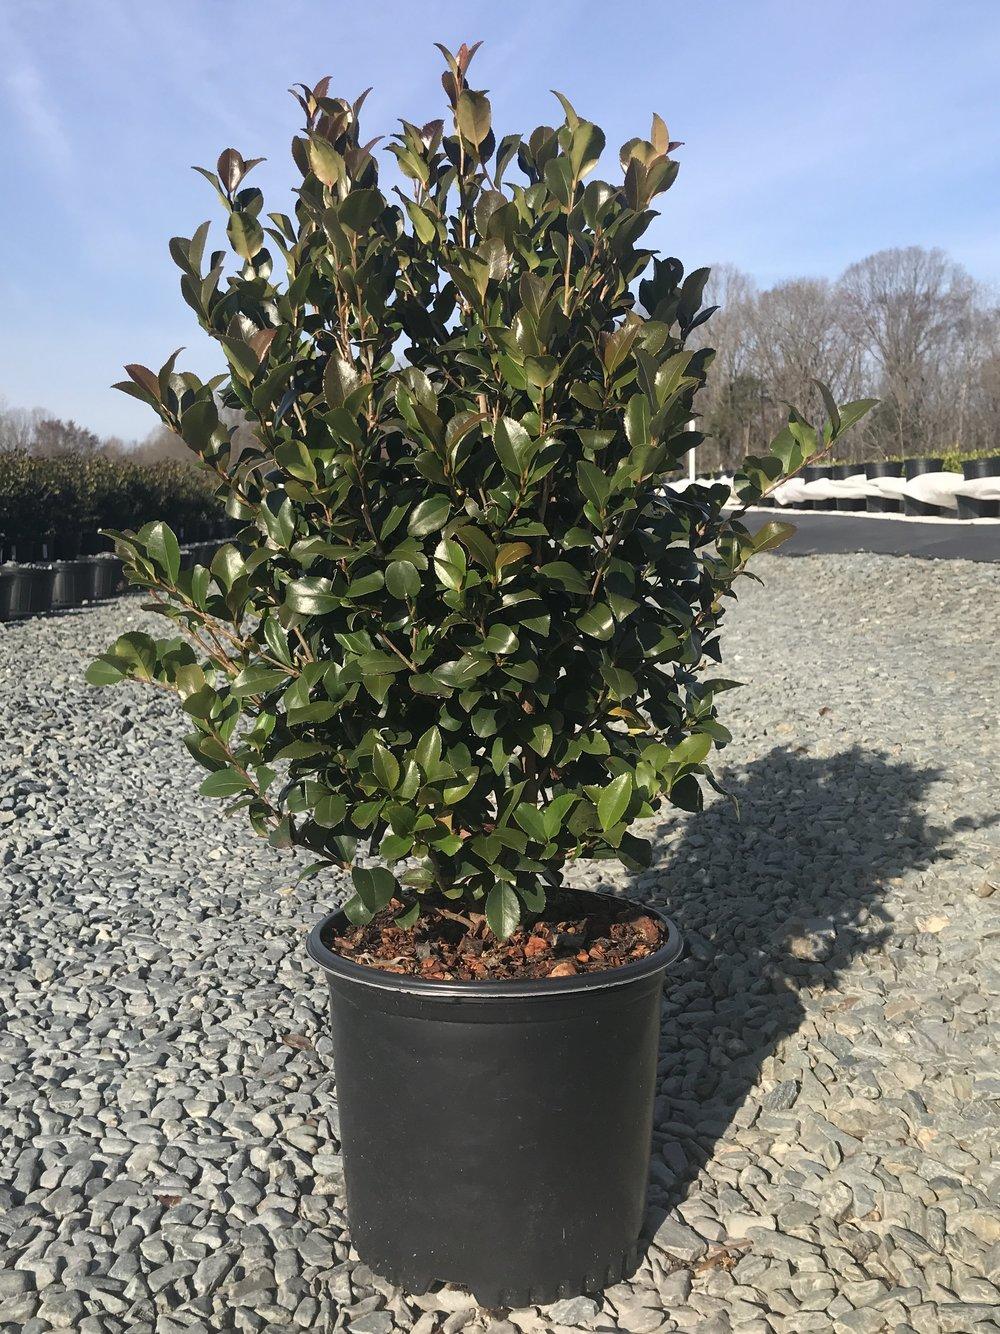 Camellia sasanqua 'Cleopatra' - 3 gallon